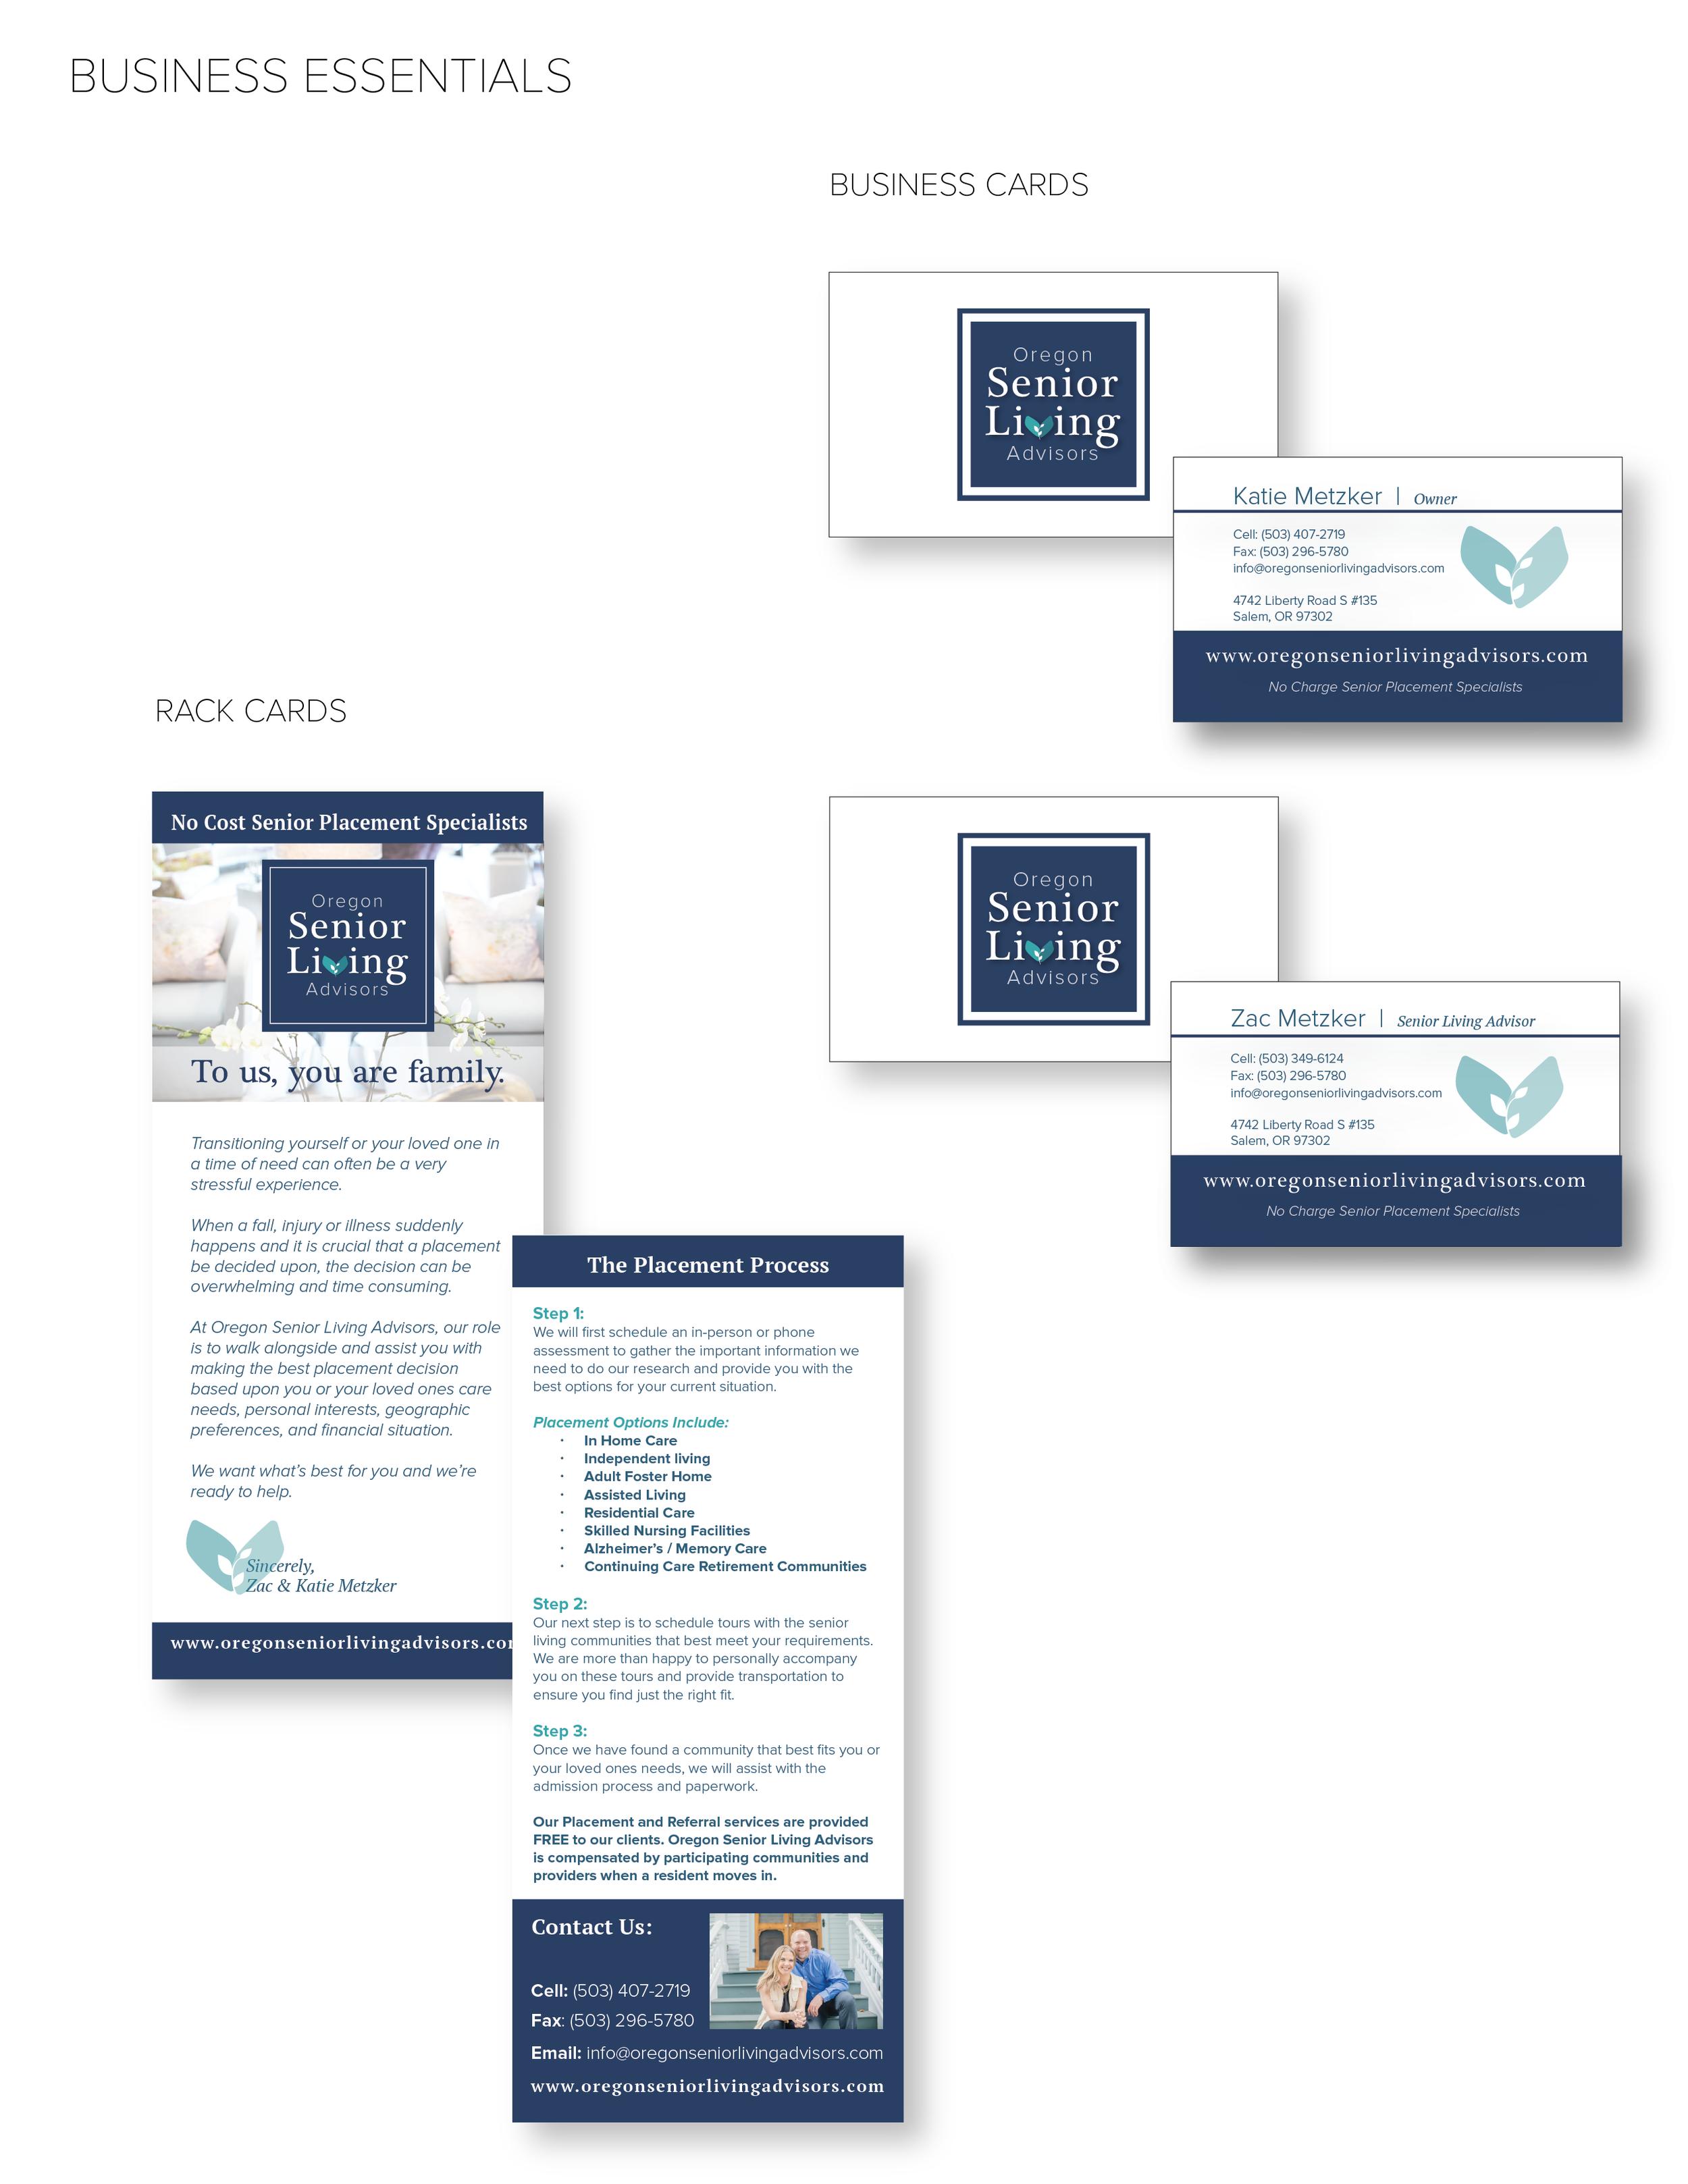 Oregon Senior Living Advisors - Business Cards designed by Brightly & Co